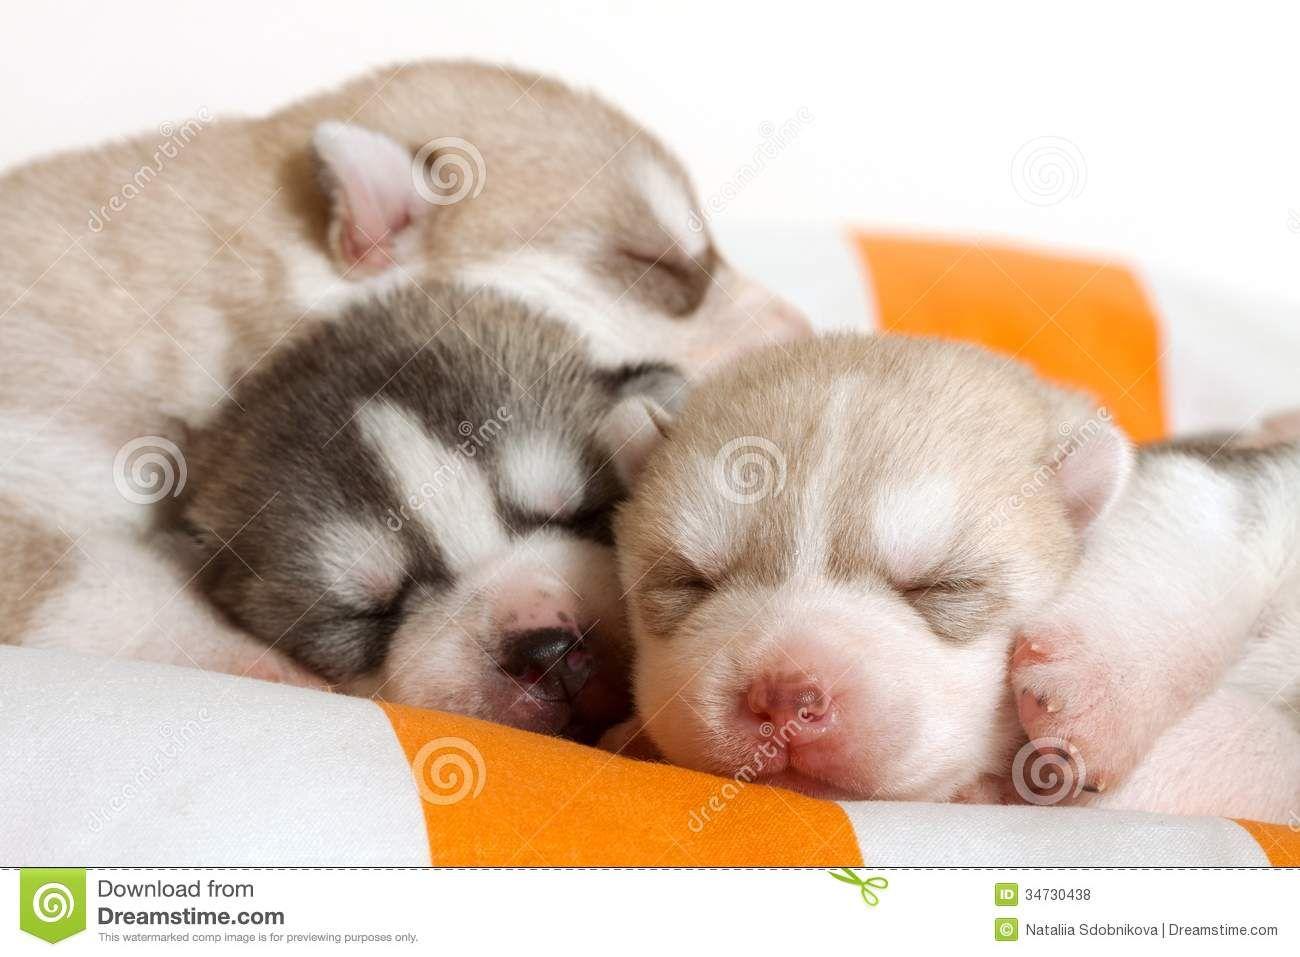 Newborn Puppy Newborn Puppies Siberian Husky Puppies Puppies